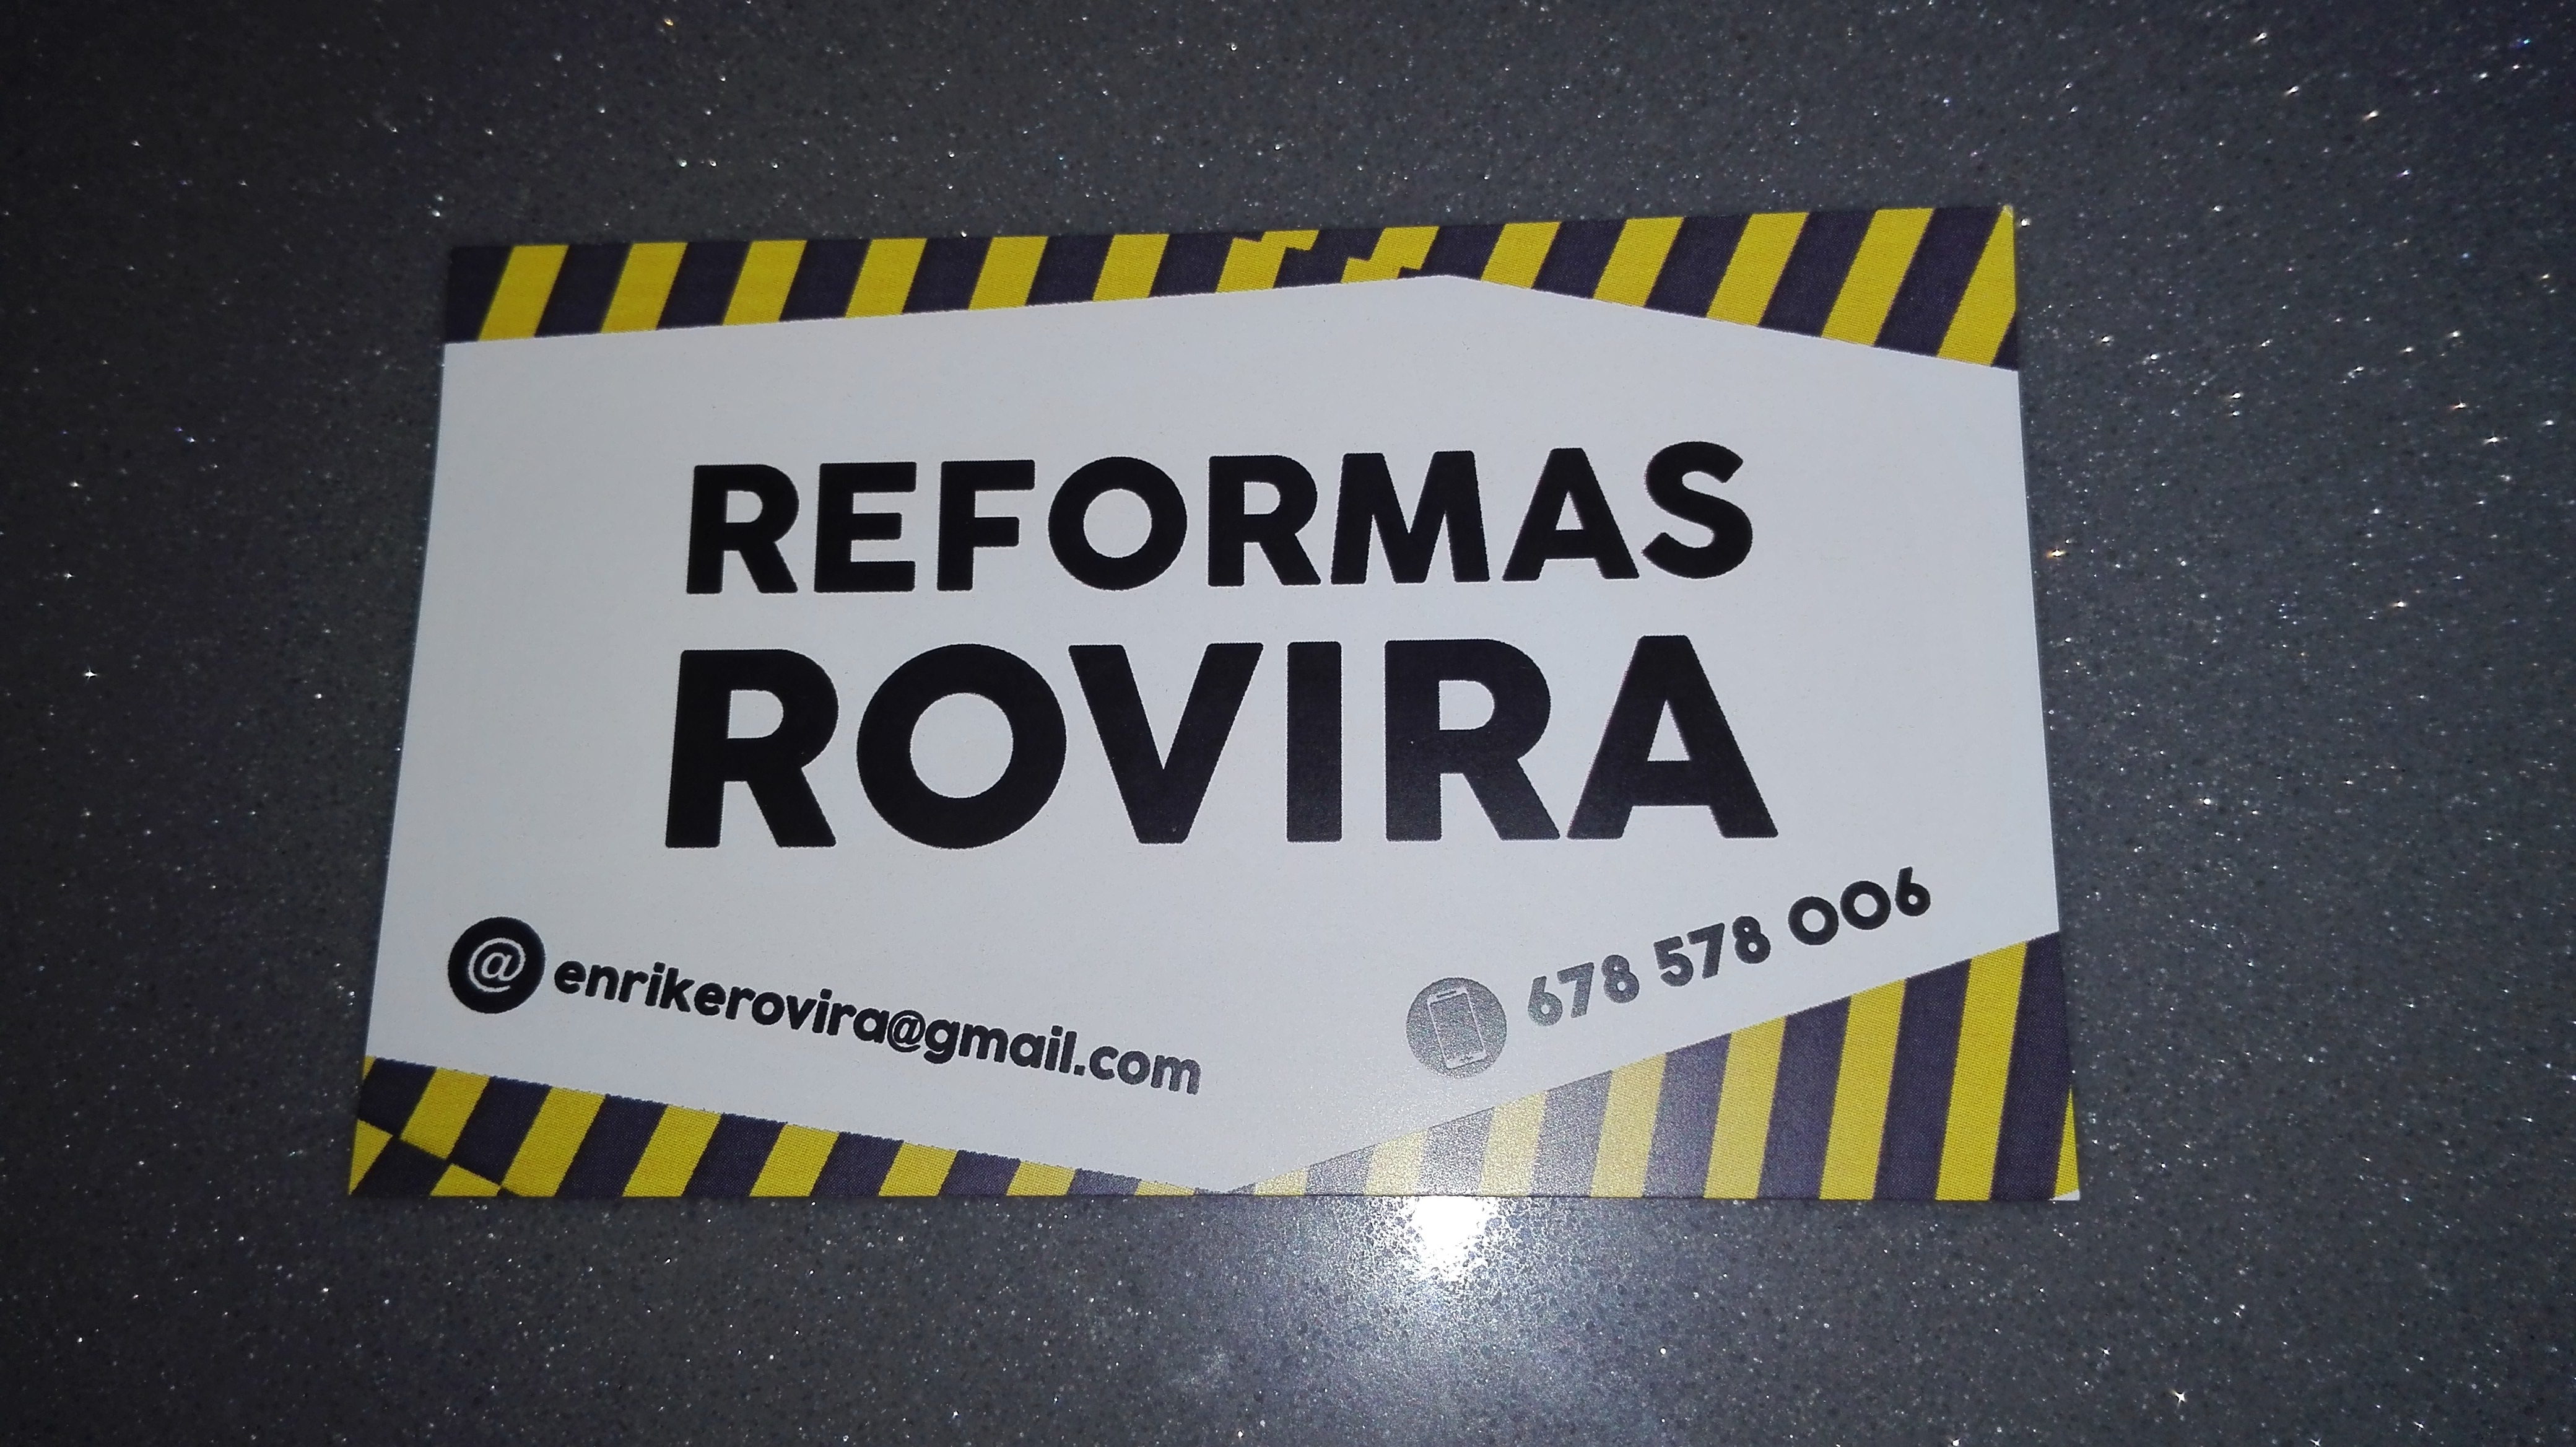 Reformas Rovira